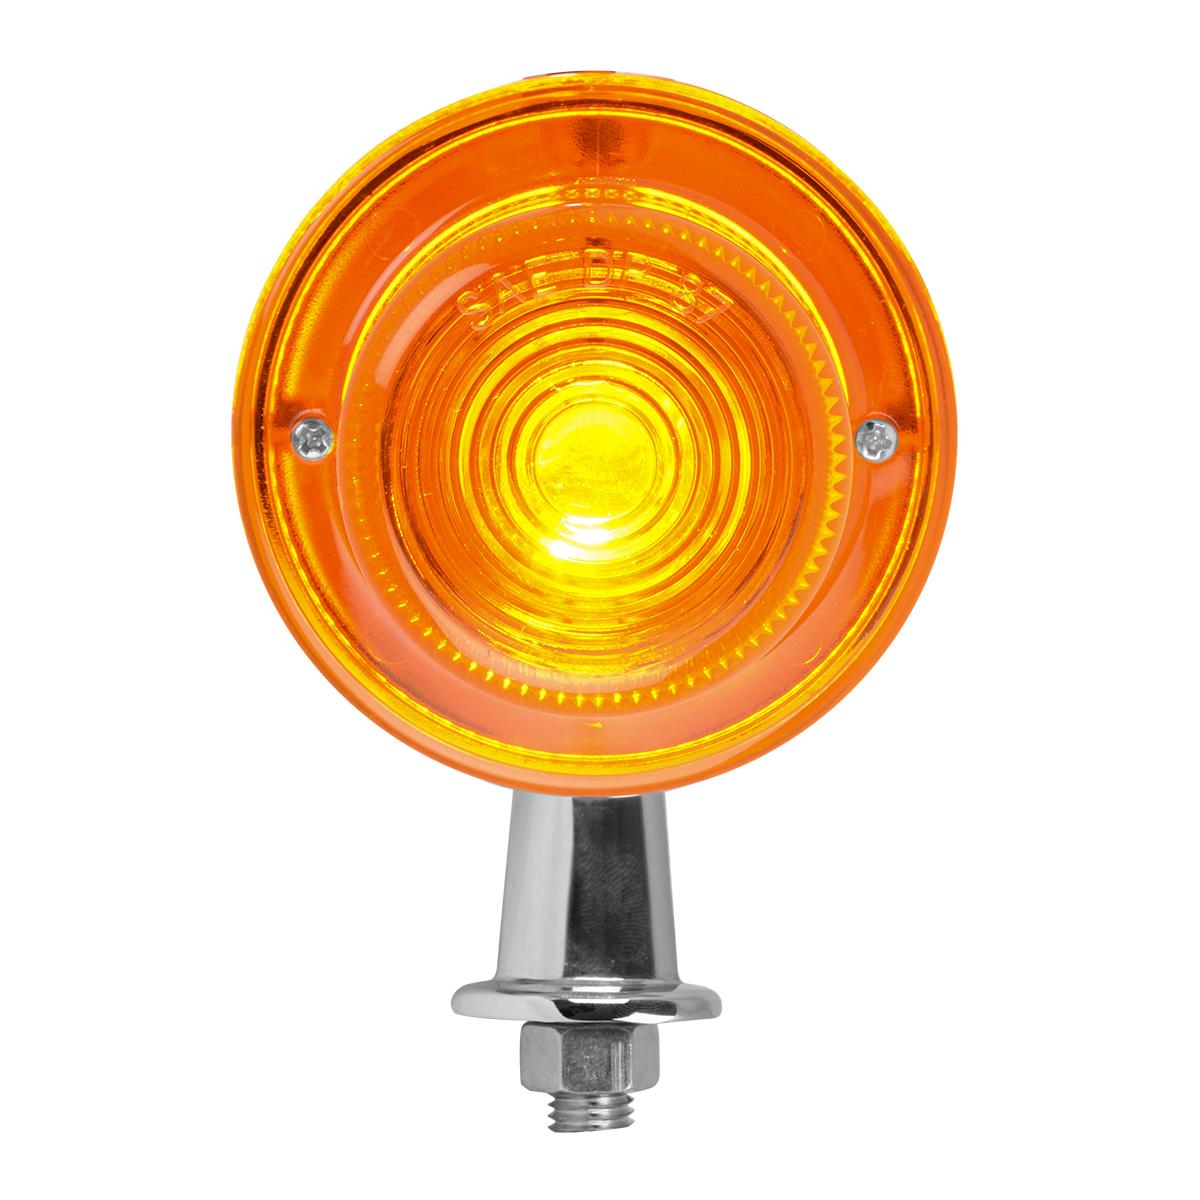 "#80751 1 ⅛"" Tanker Amber Light - 1 Wire"